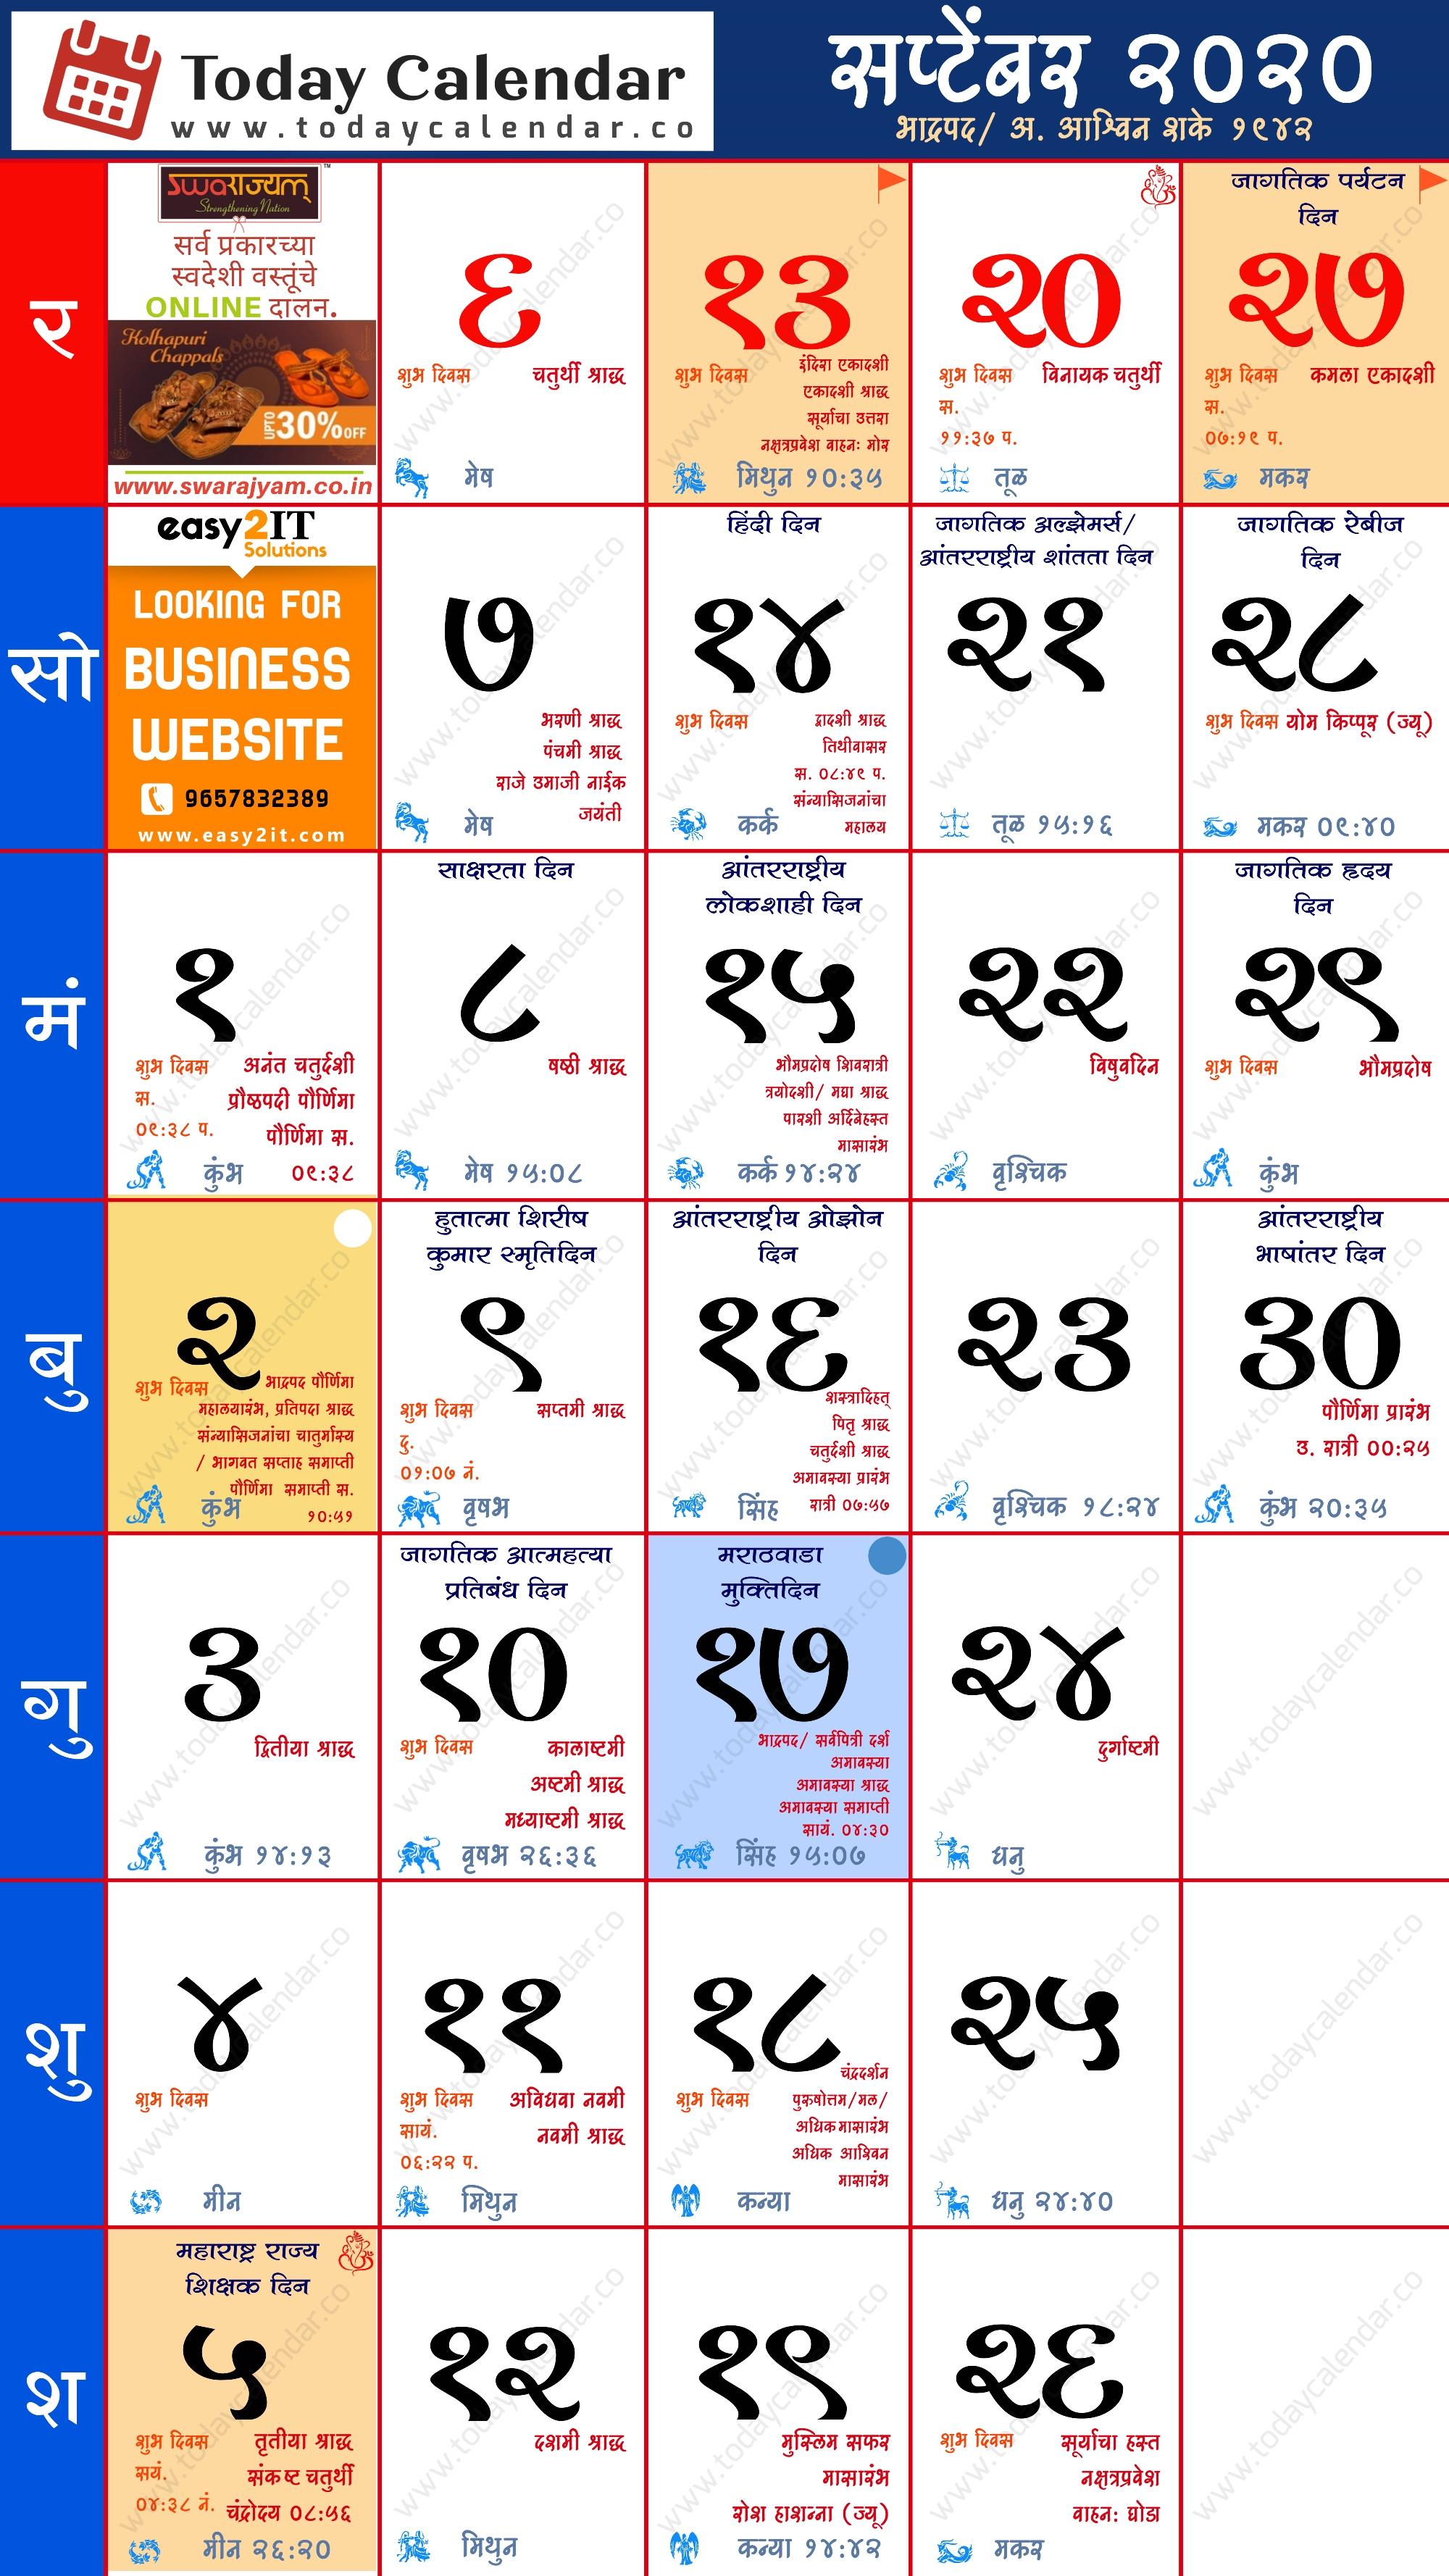 september marathi calendar 2020 todaycalendar